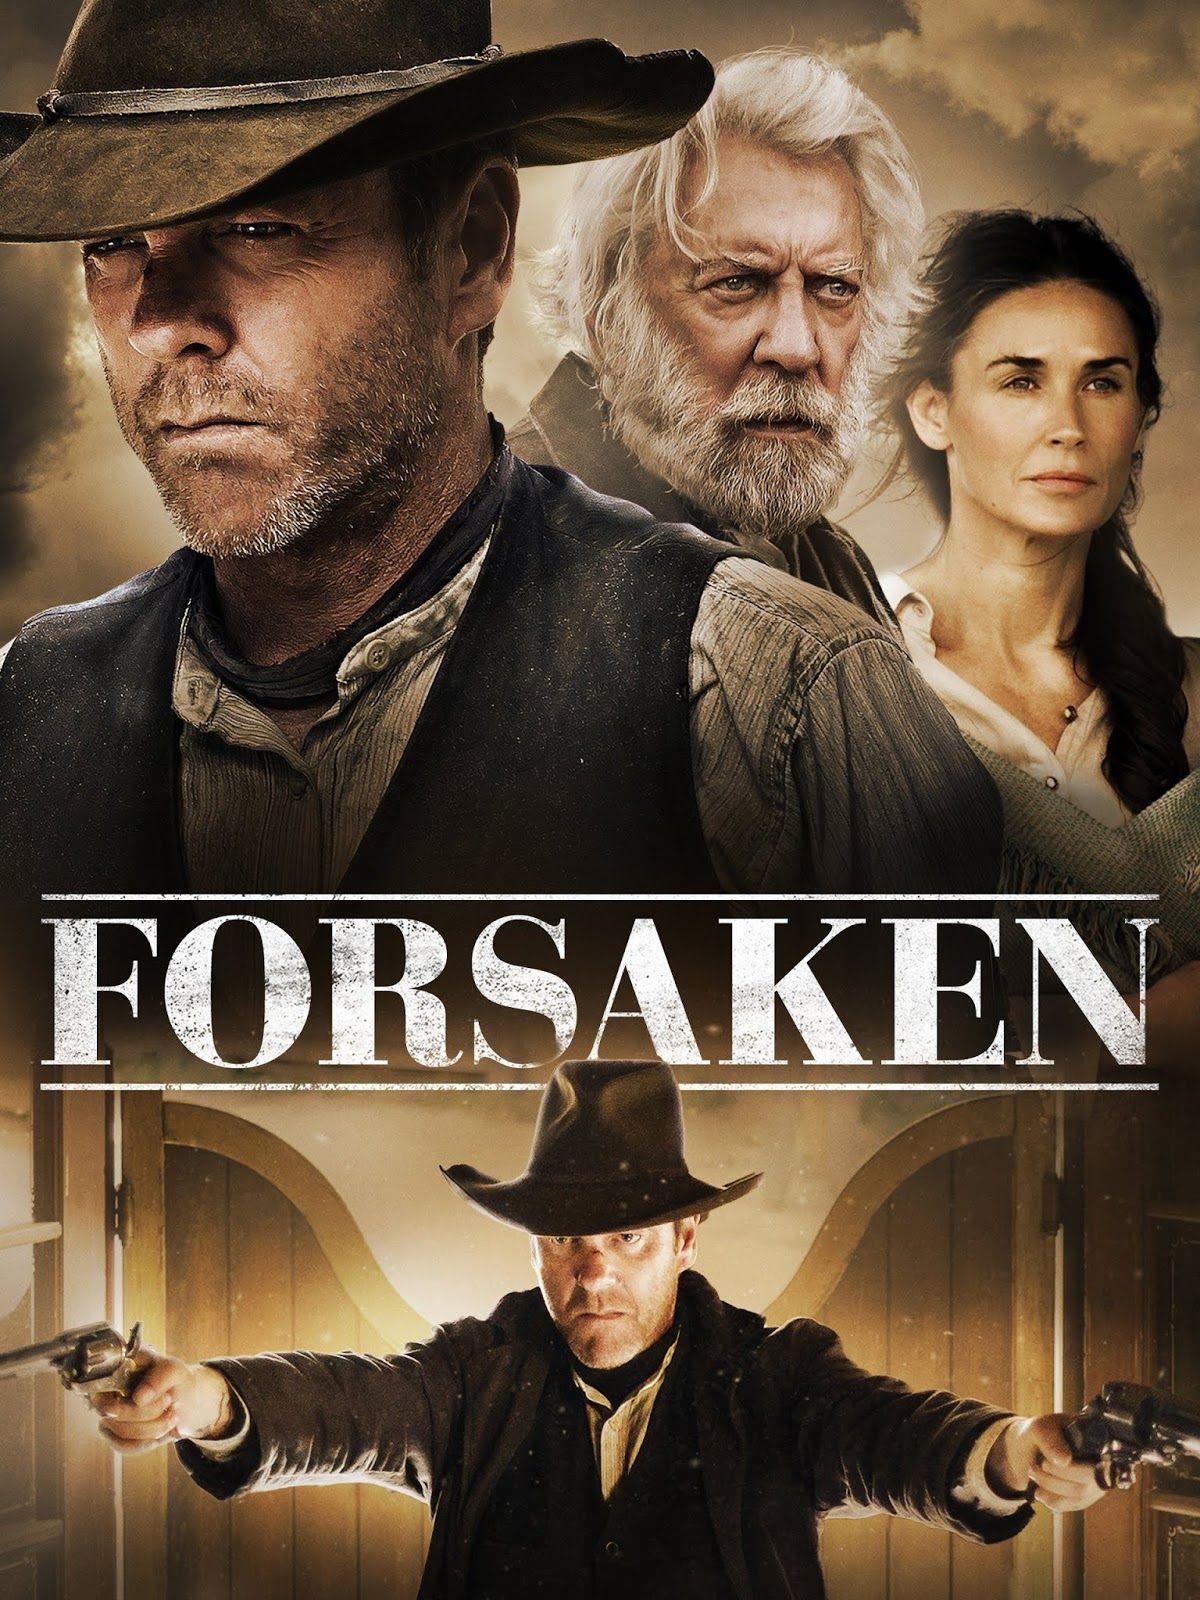 Forsaken Kiefer & Donald Sutherland Movies online